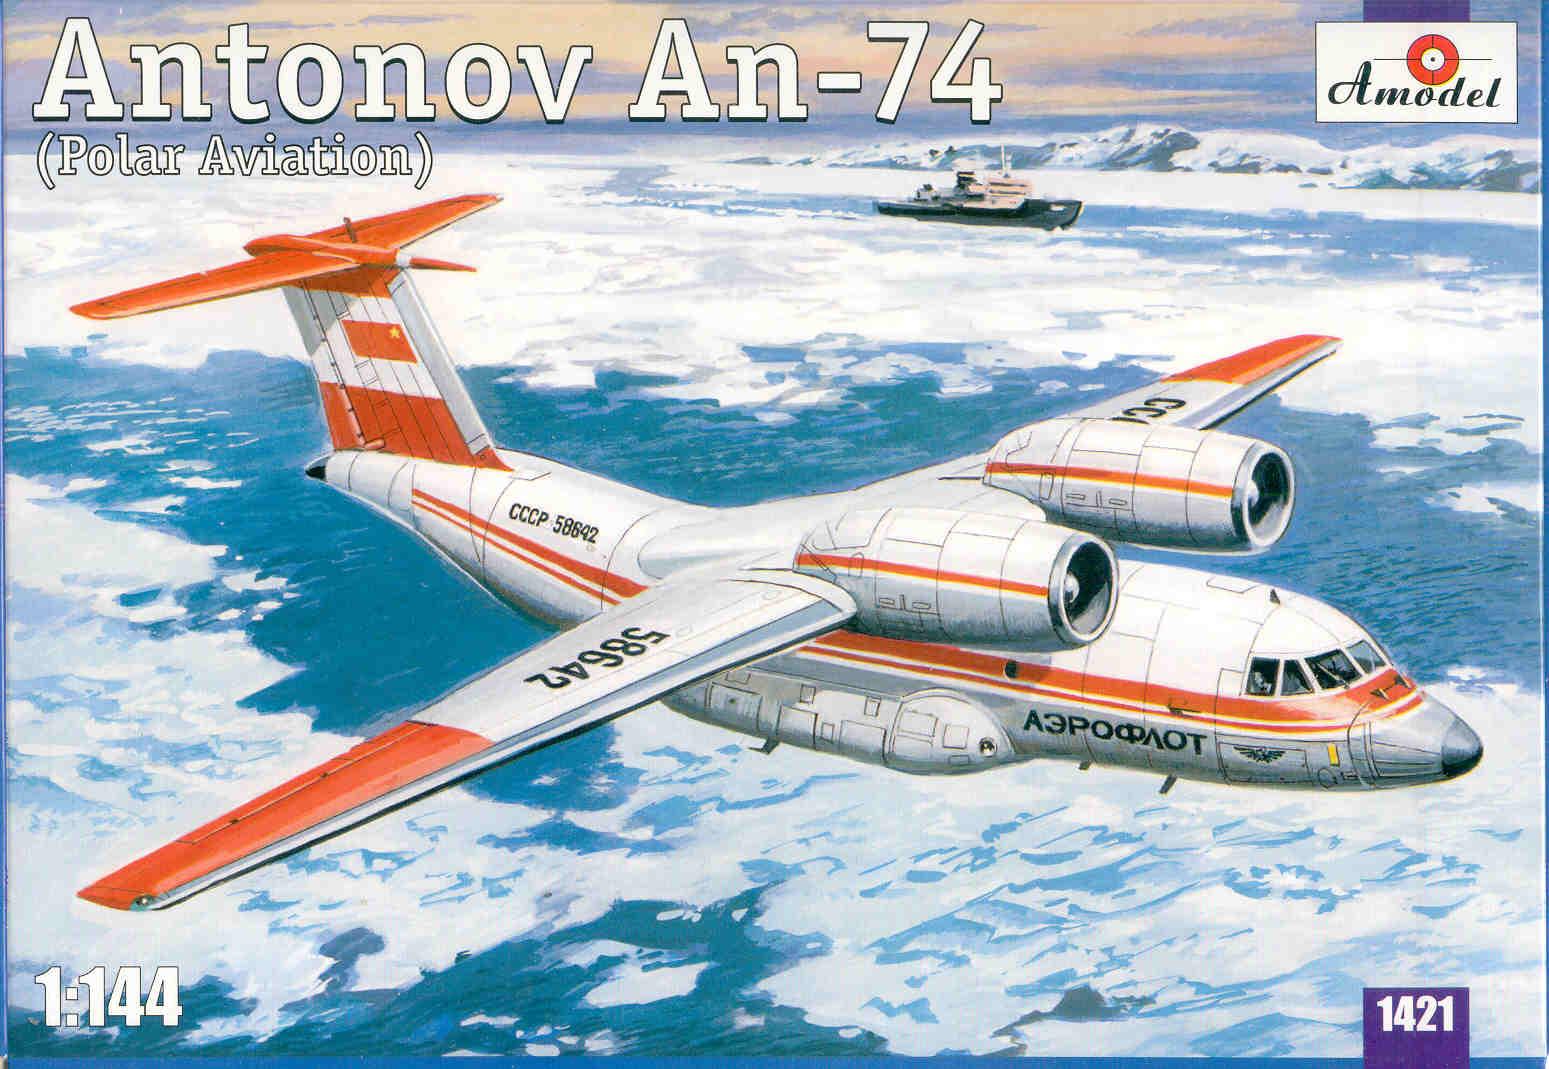 Antonov An-74 Polar 1/144 Amodel 1421 ...